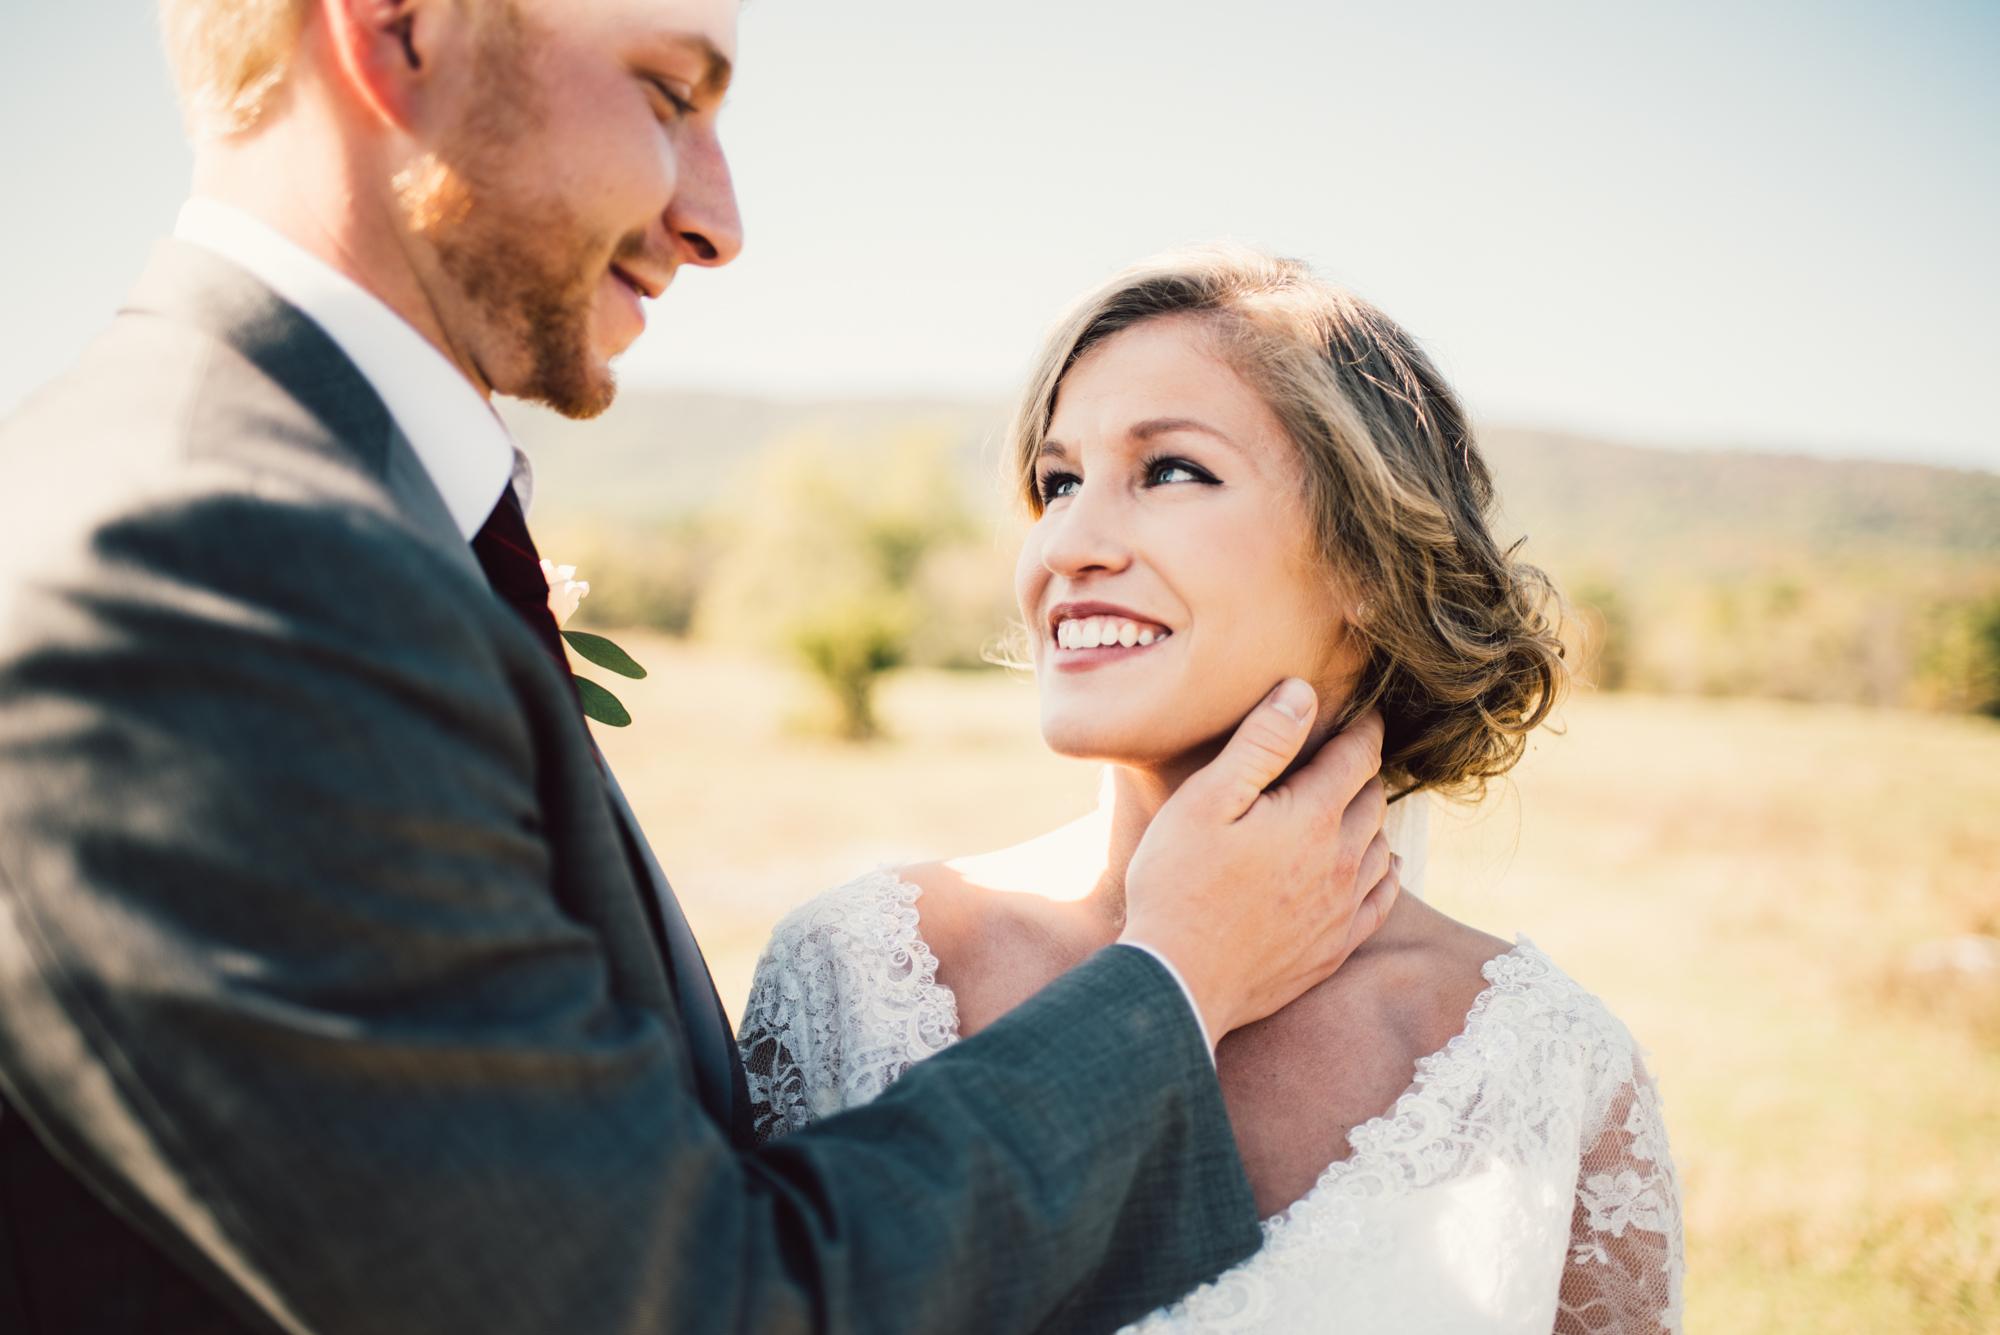 Ashley-and-Michael-Beaune-Woodstock-Virginia-Wedding-Shenandoah-Valley_18.JPG